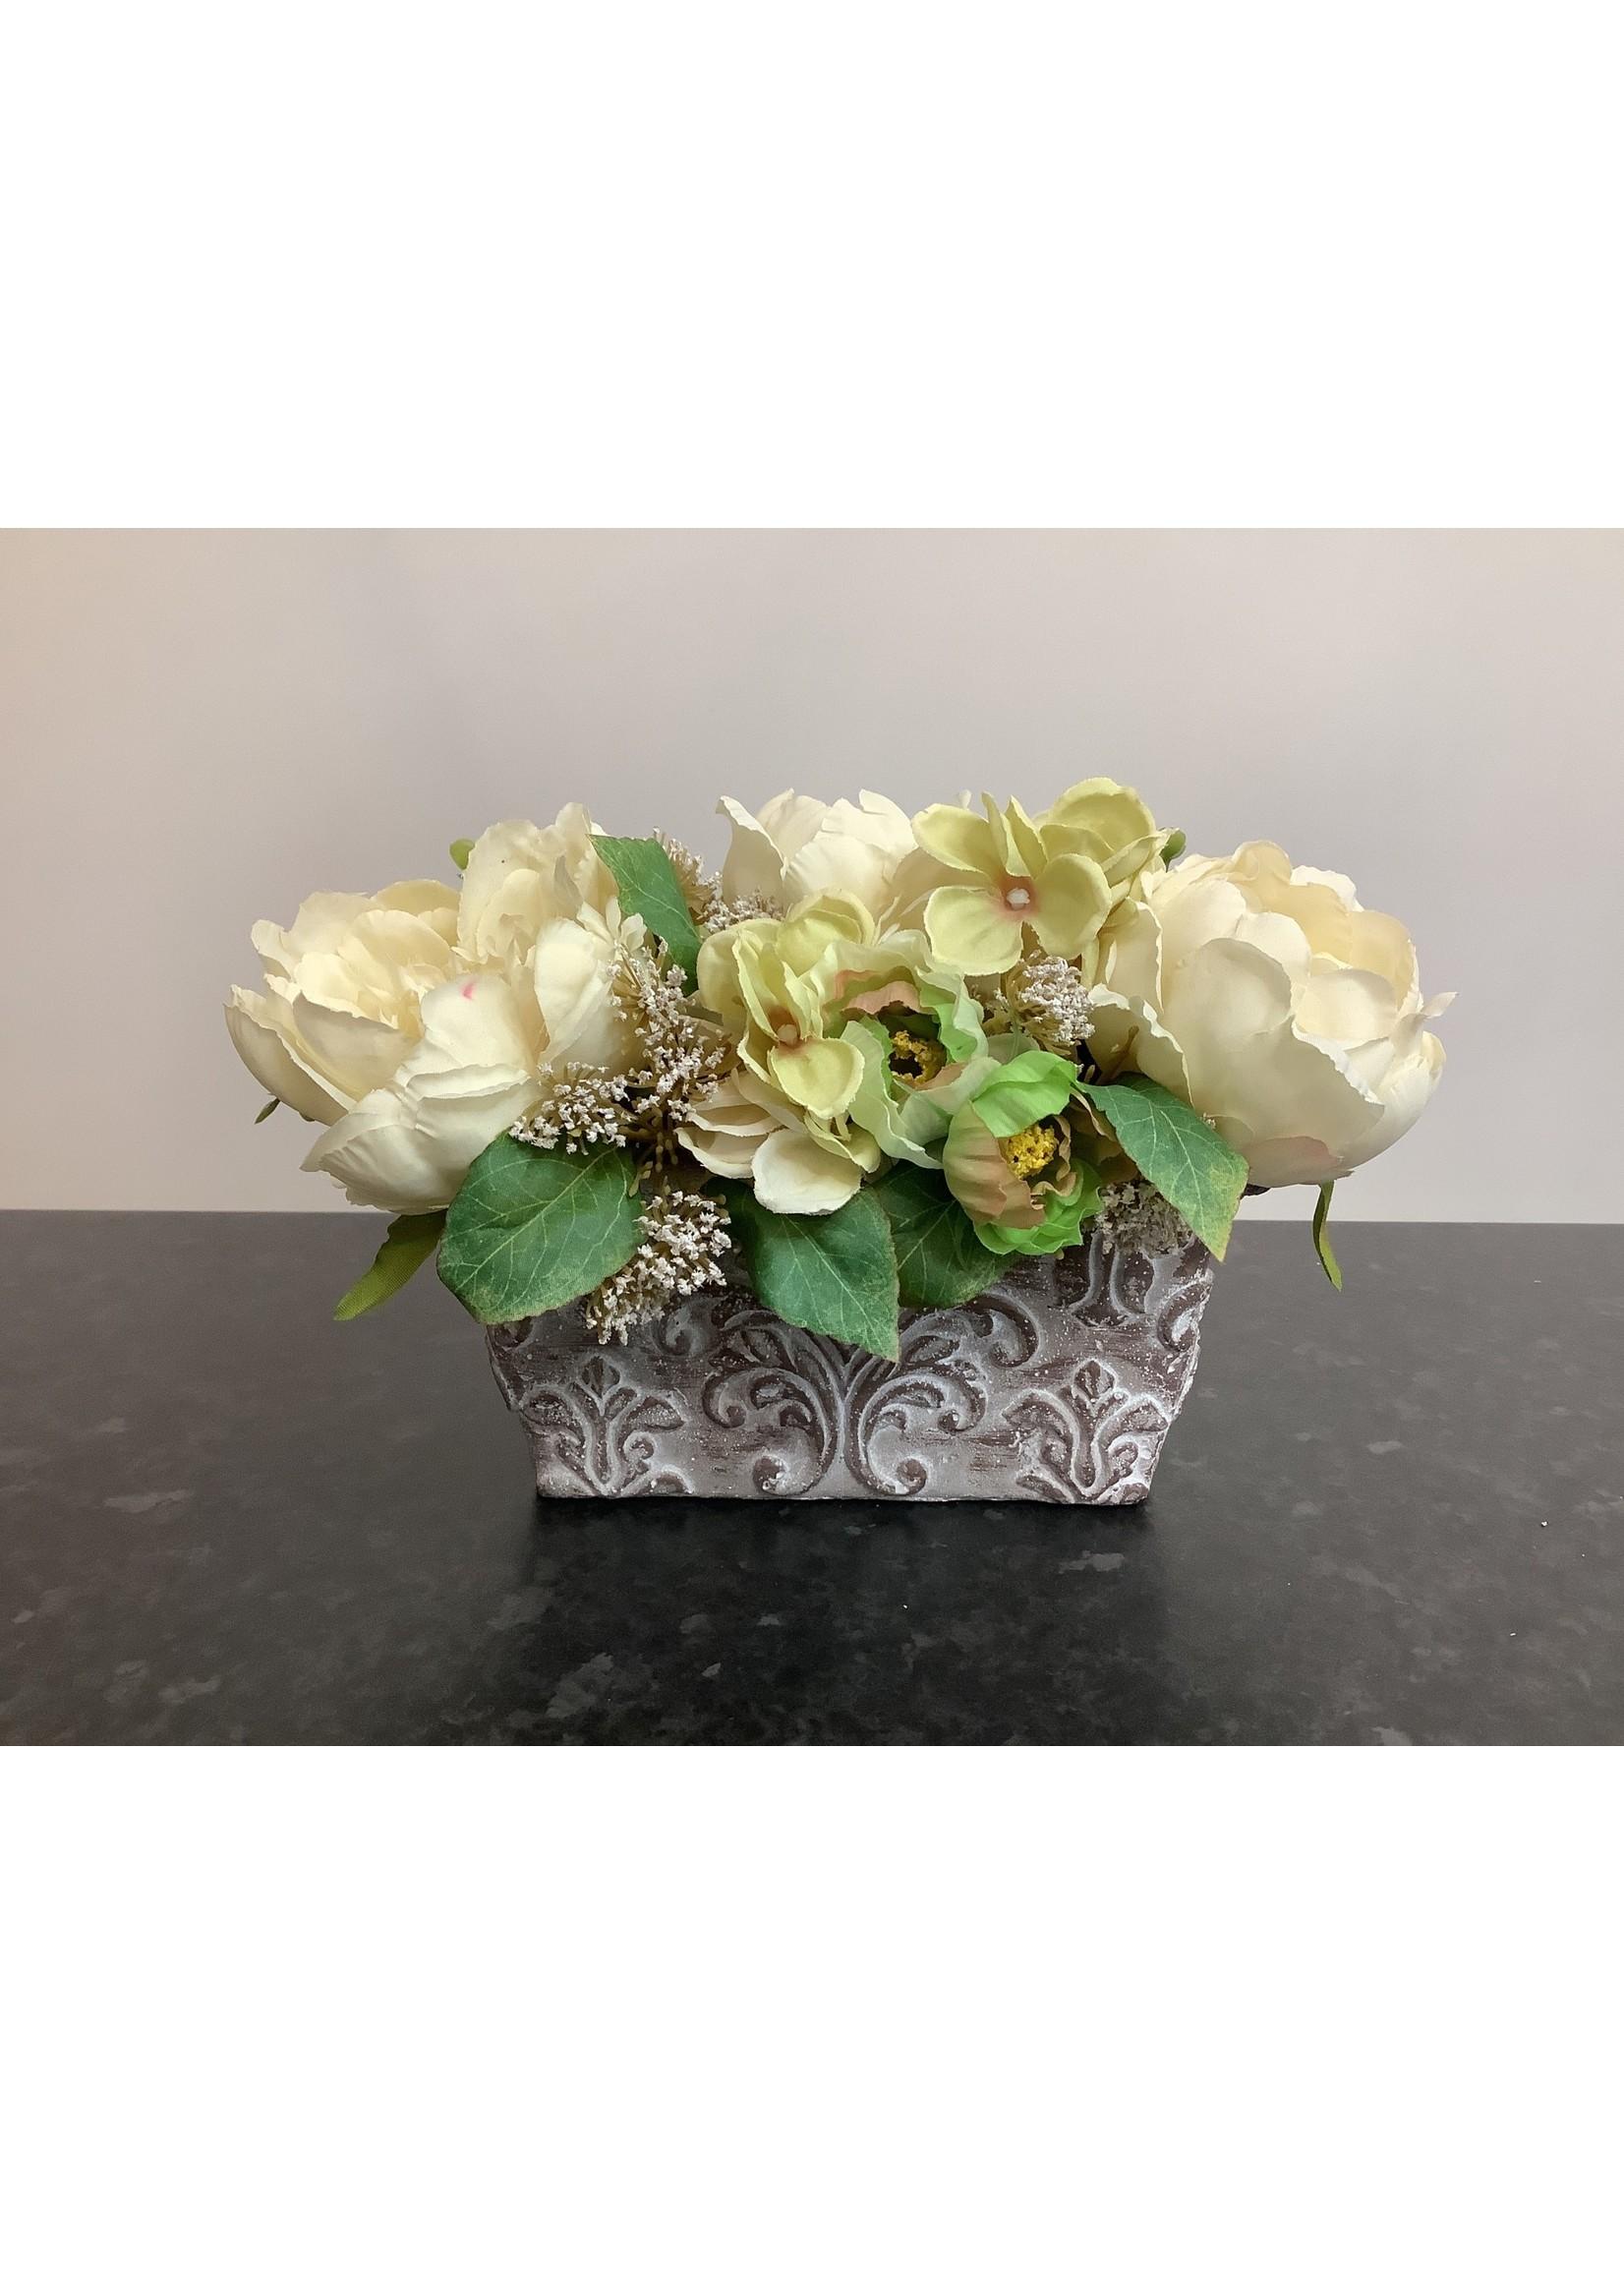 Small vintage flowers in oblong vase 18x18cm